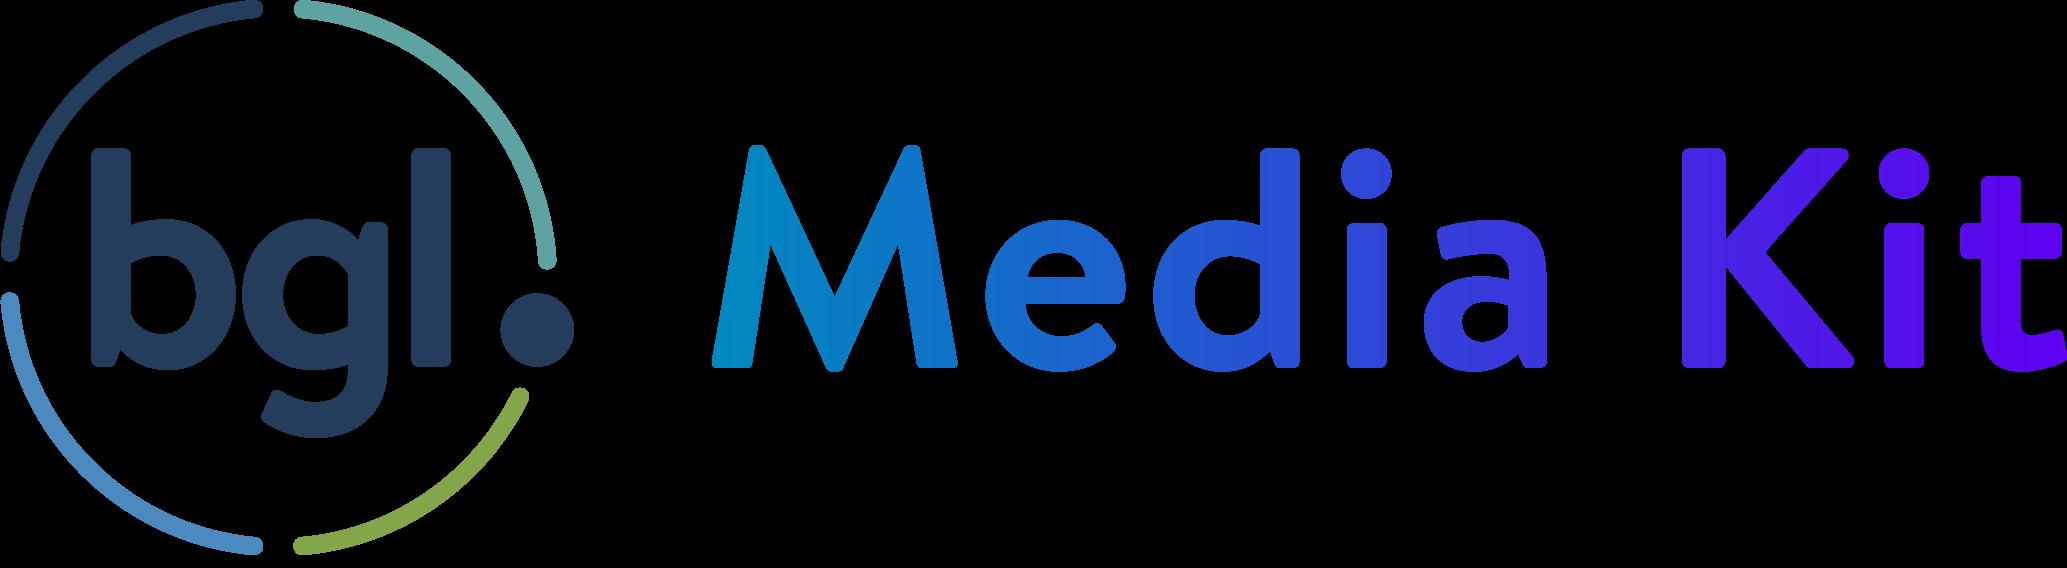 BGL Media Kit | BGL, Simple Fund 360 and CAS 360.